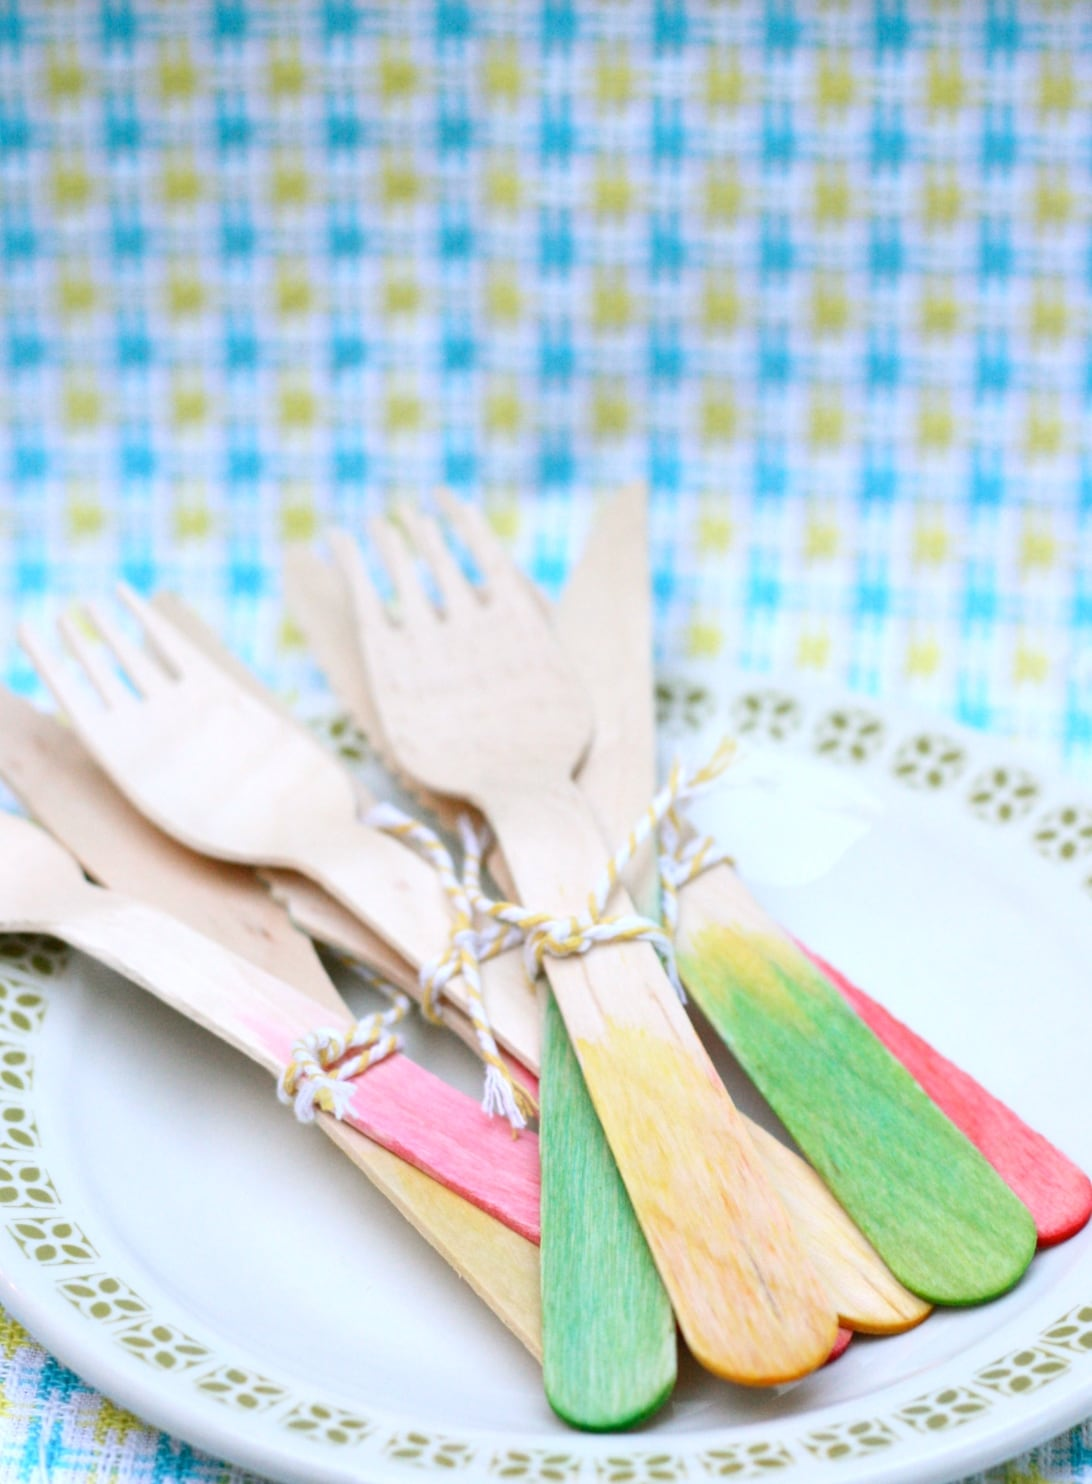 dip dye cutlery